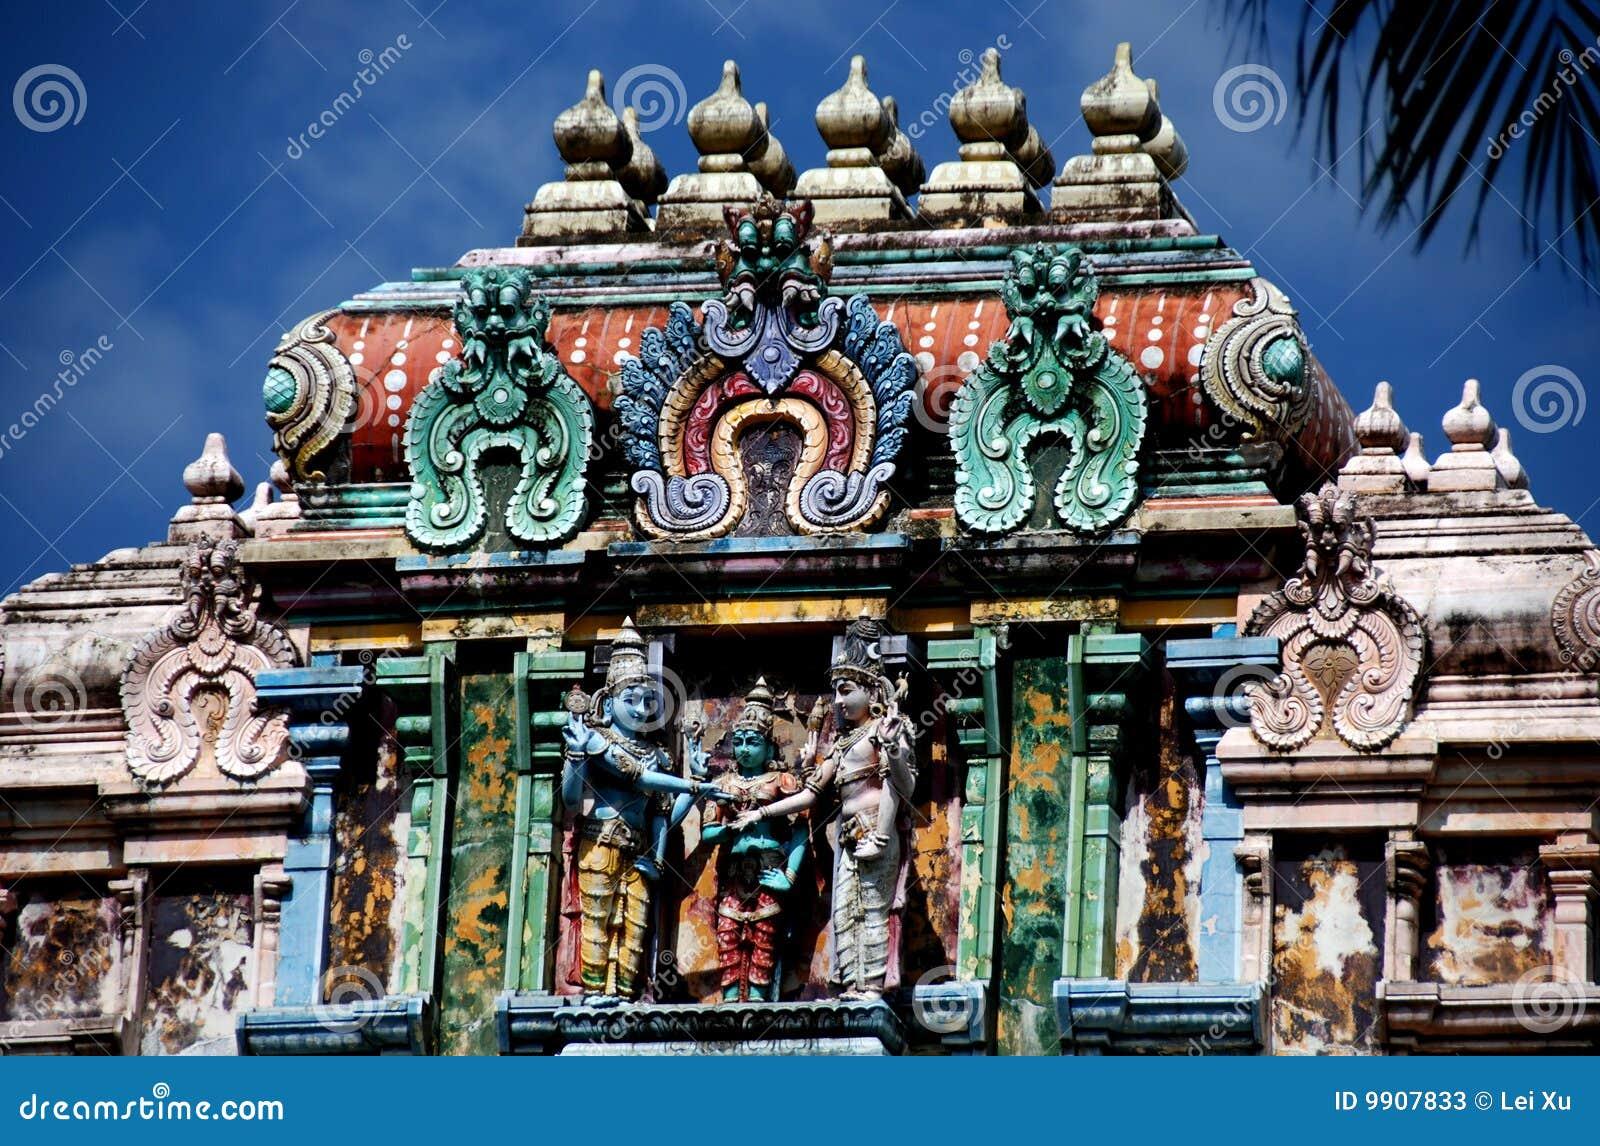 Thandayuthapani Temple Photos   Free & Royalty Free Stock Photos ...